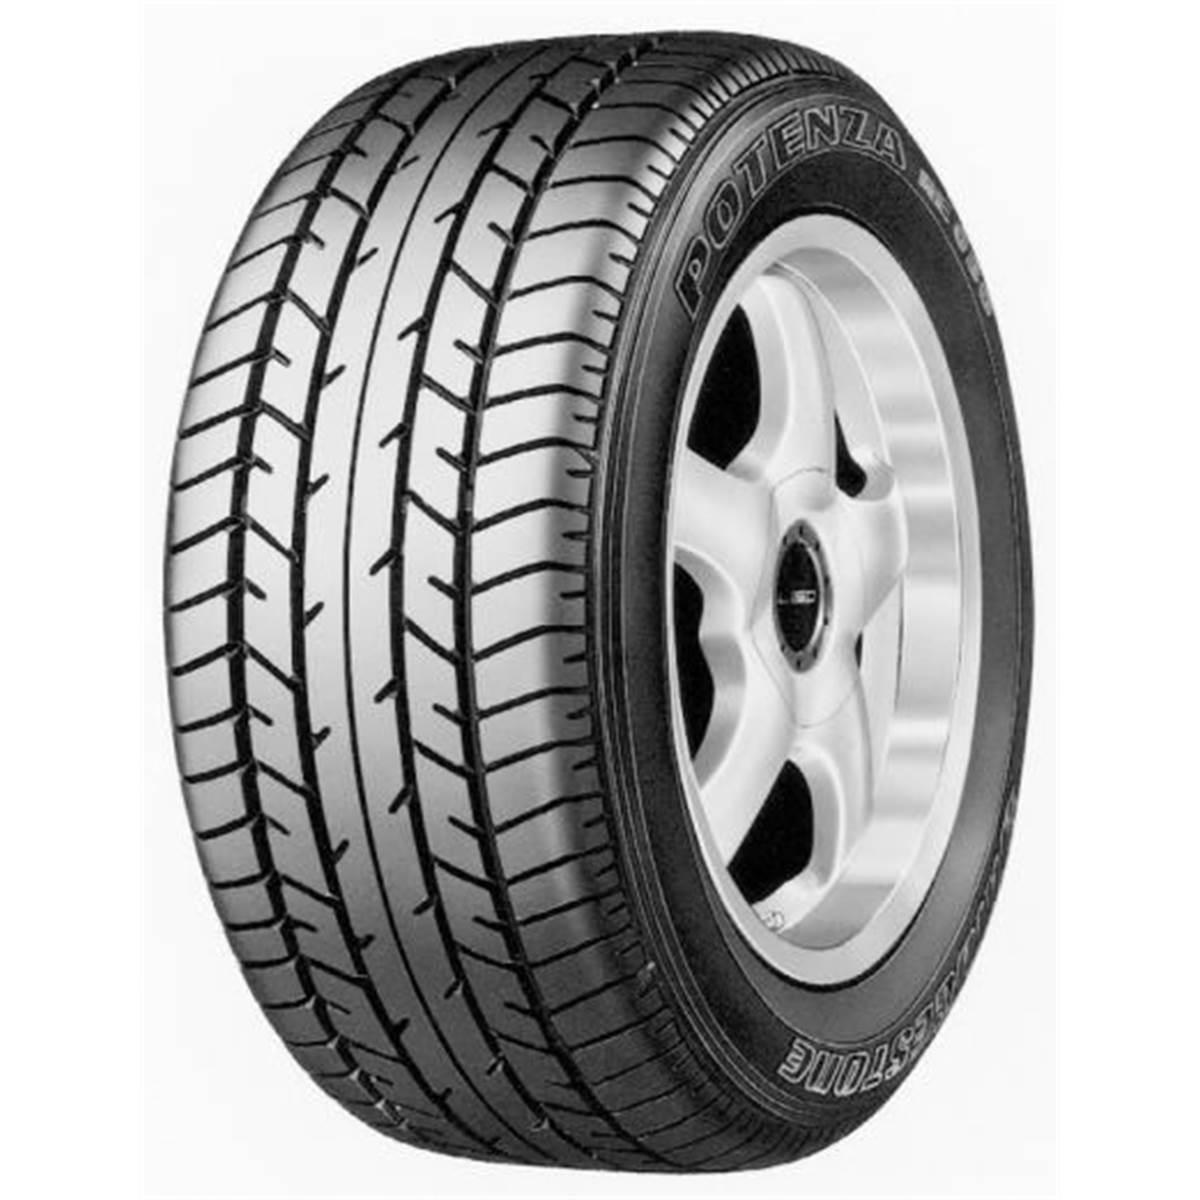 Pneu Bridgestone 165/55R15 75V Potenza Re030